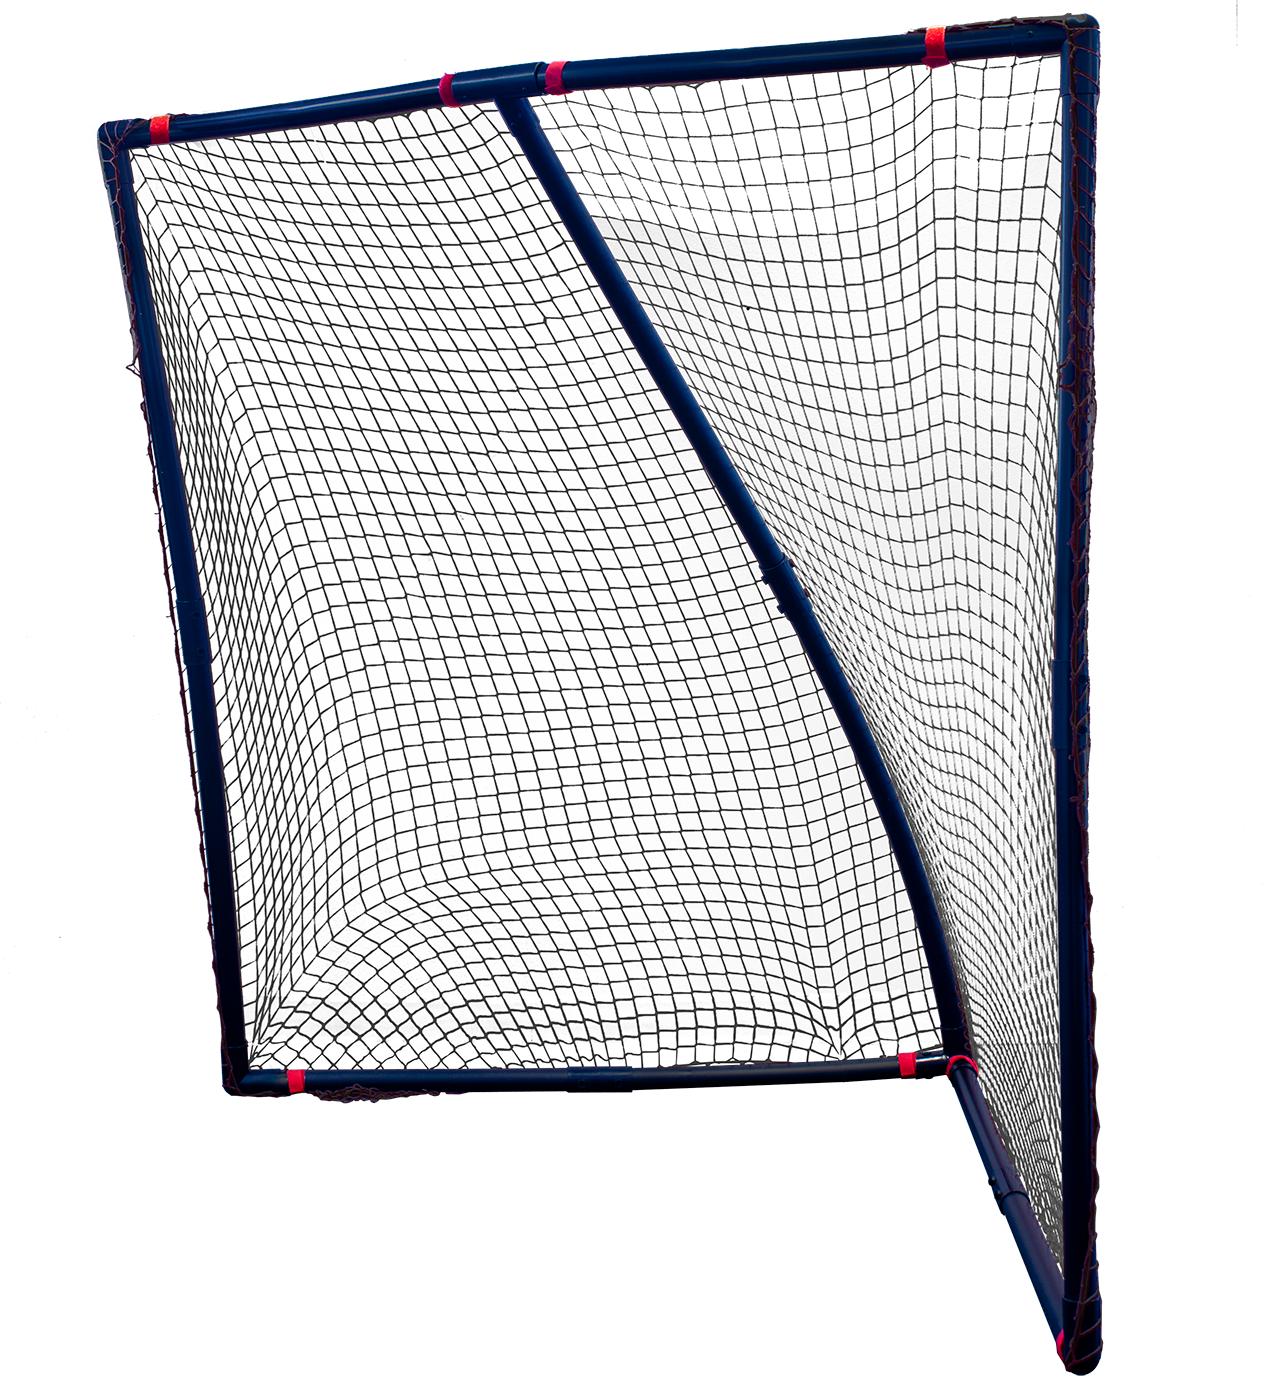 Polyflex 6 Ft Practice Lacrosse Goal High Impact Black